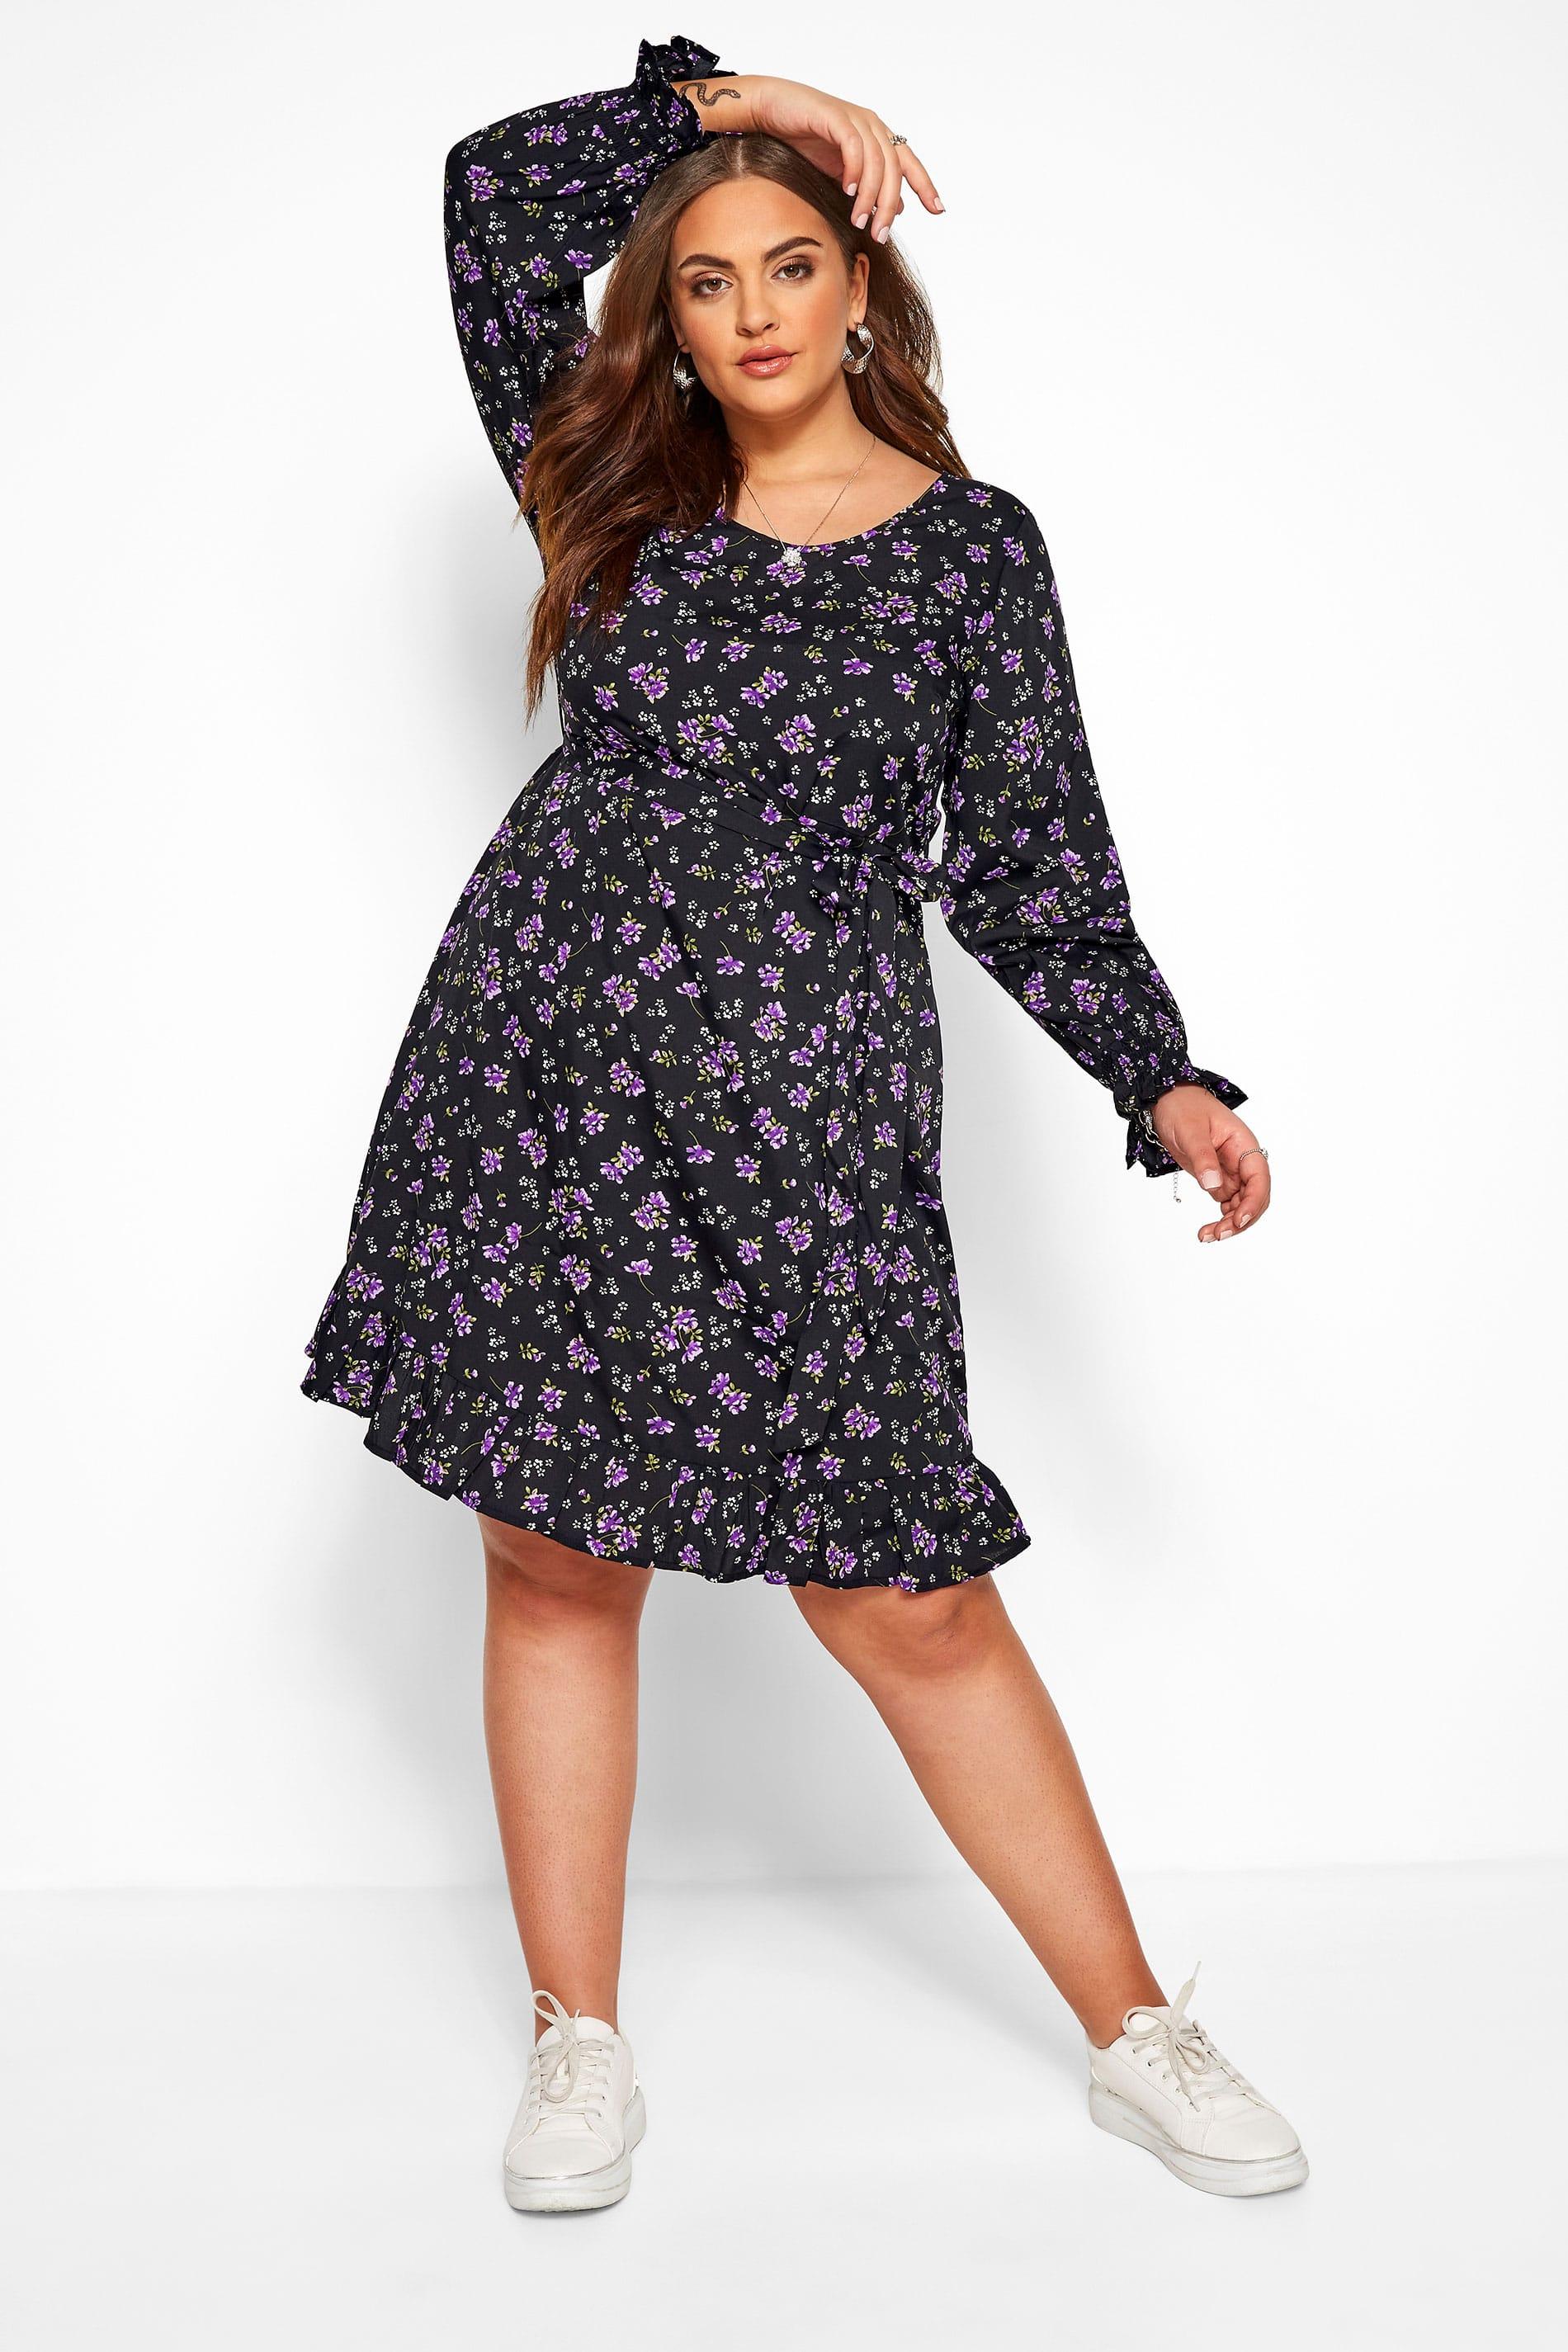 Black & Purple Floral Ruffle Dress